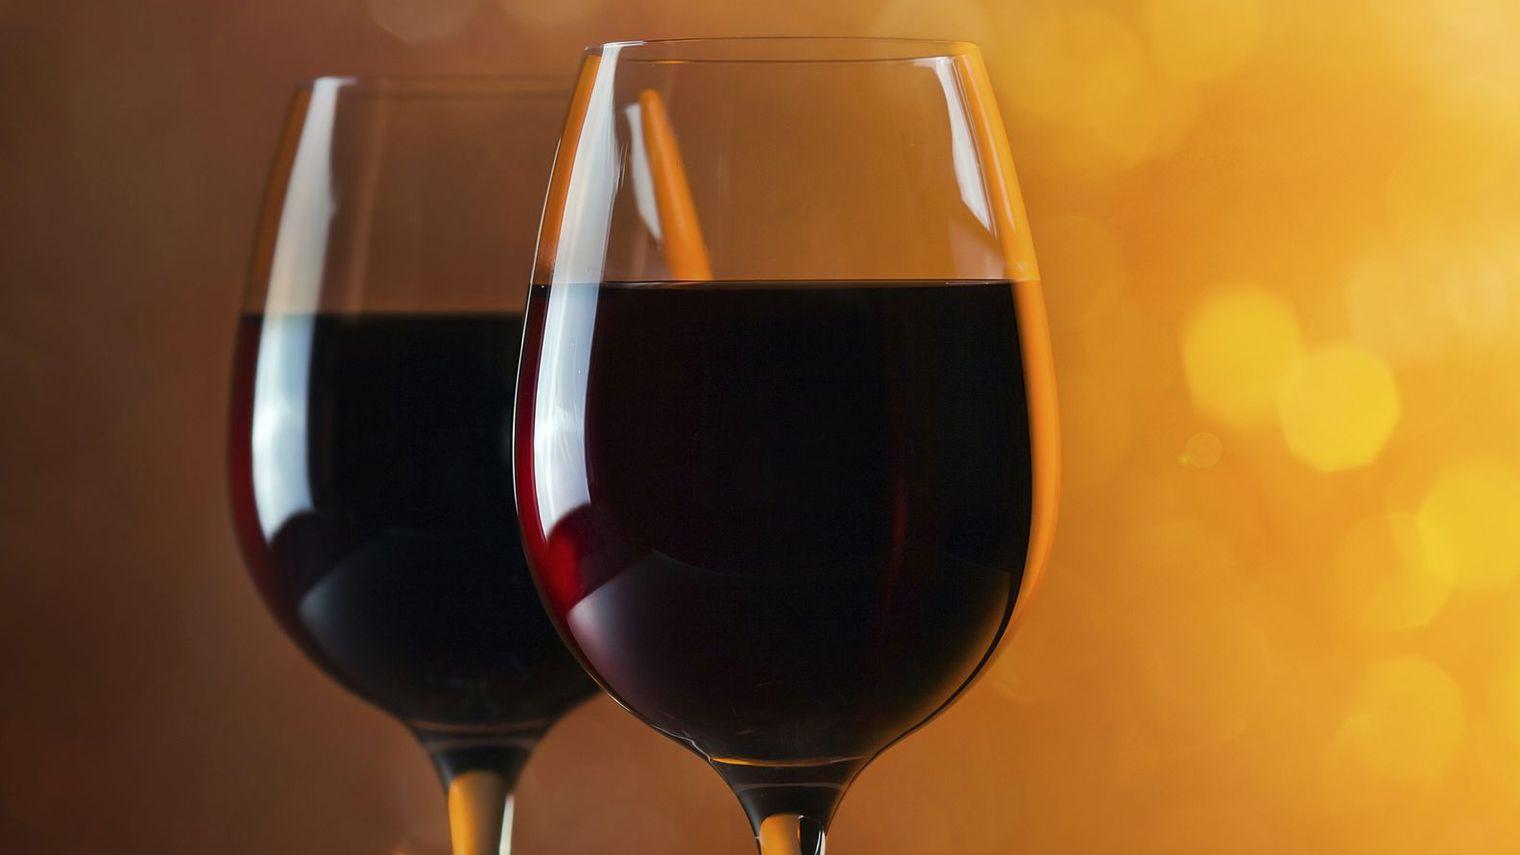 nos repas contentent nos attentes avec du vin rhone. Black Bedroom Furniture Sets. Home Design Ideas